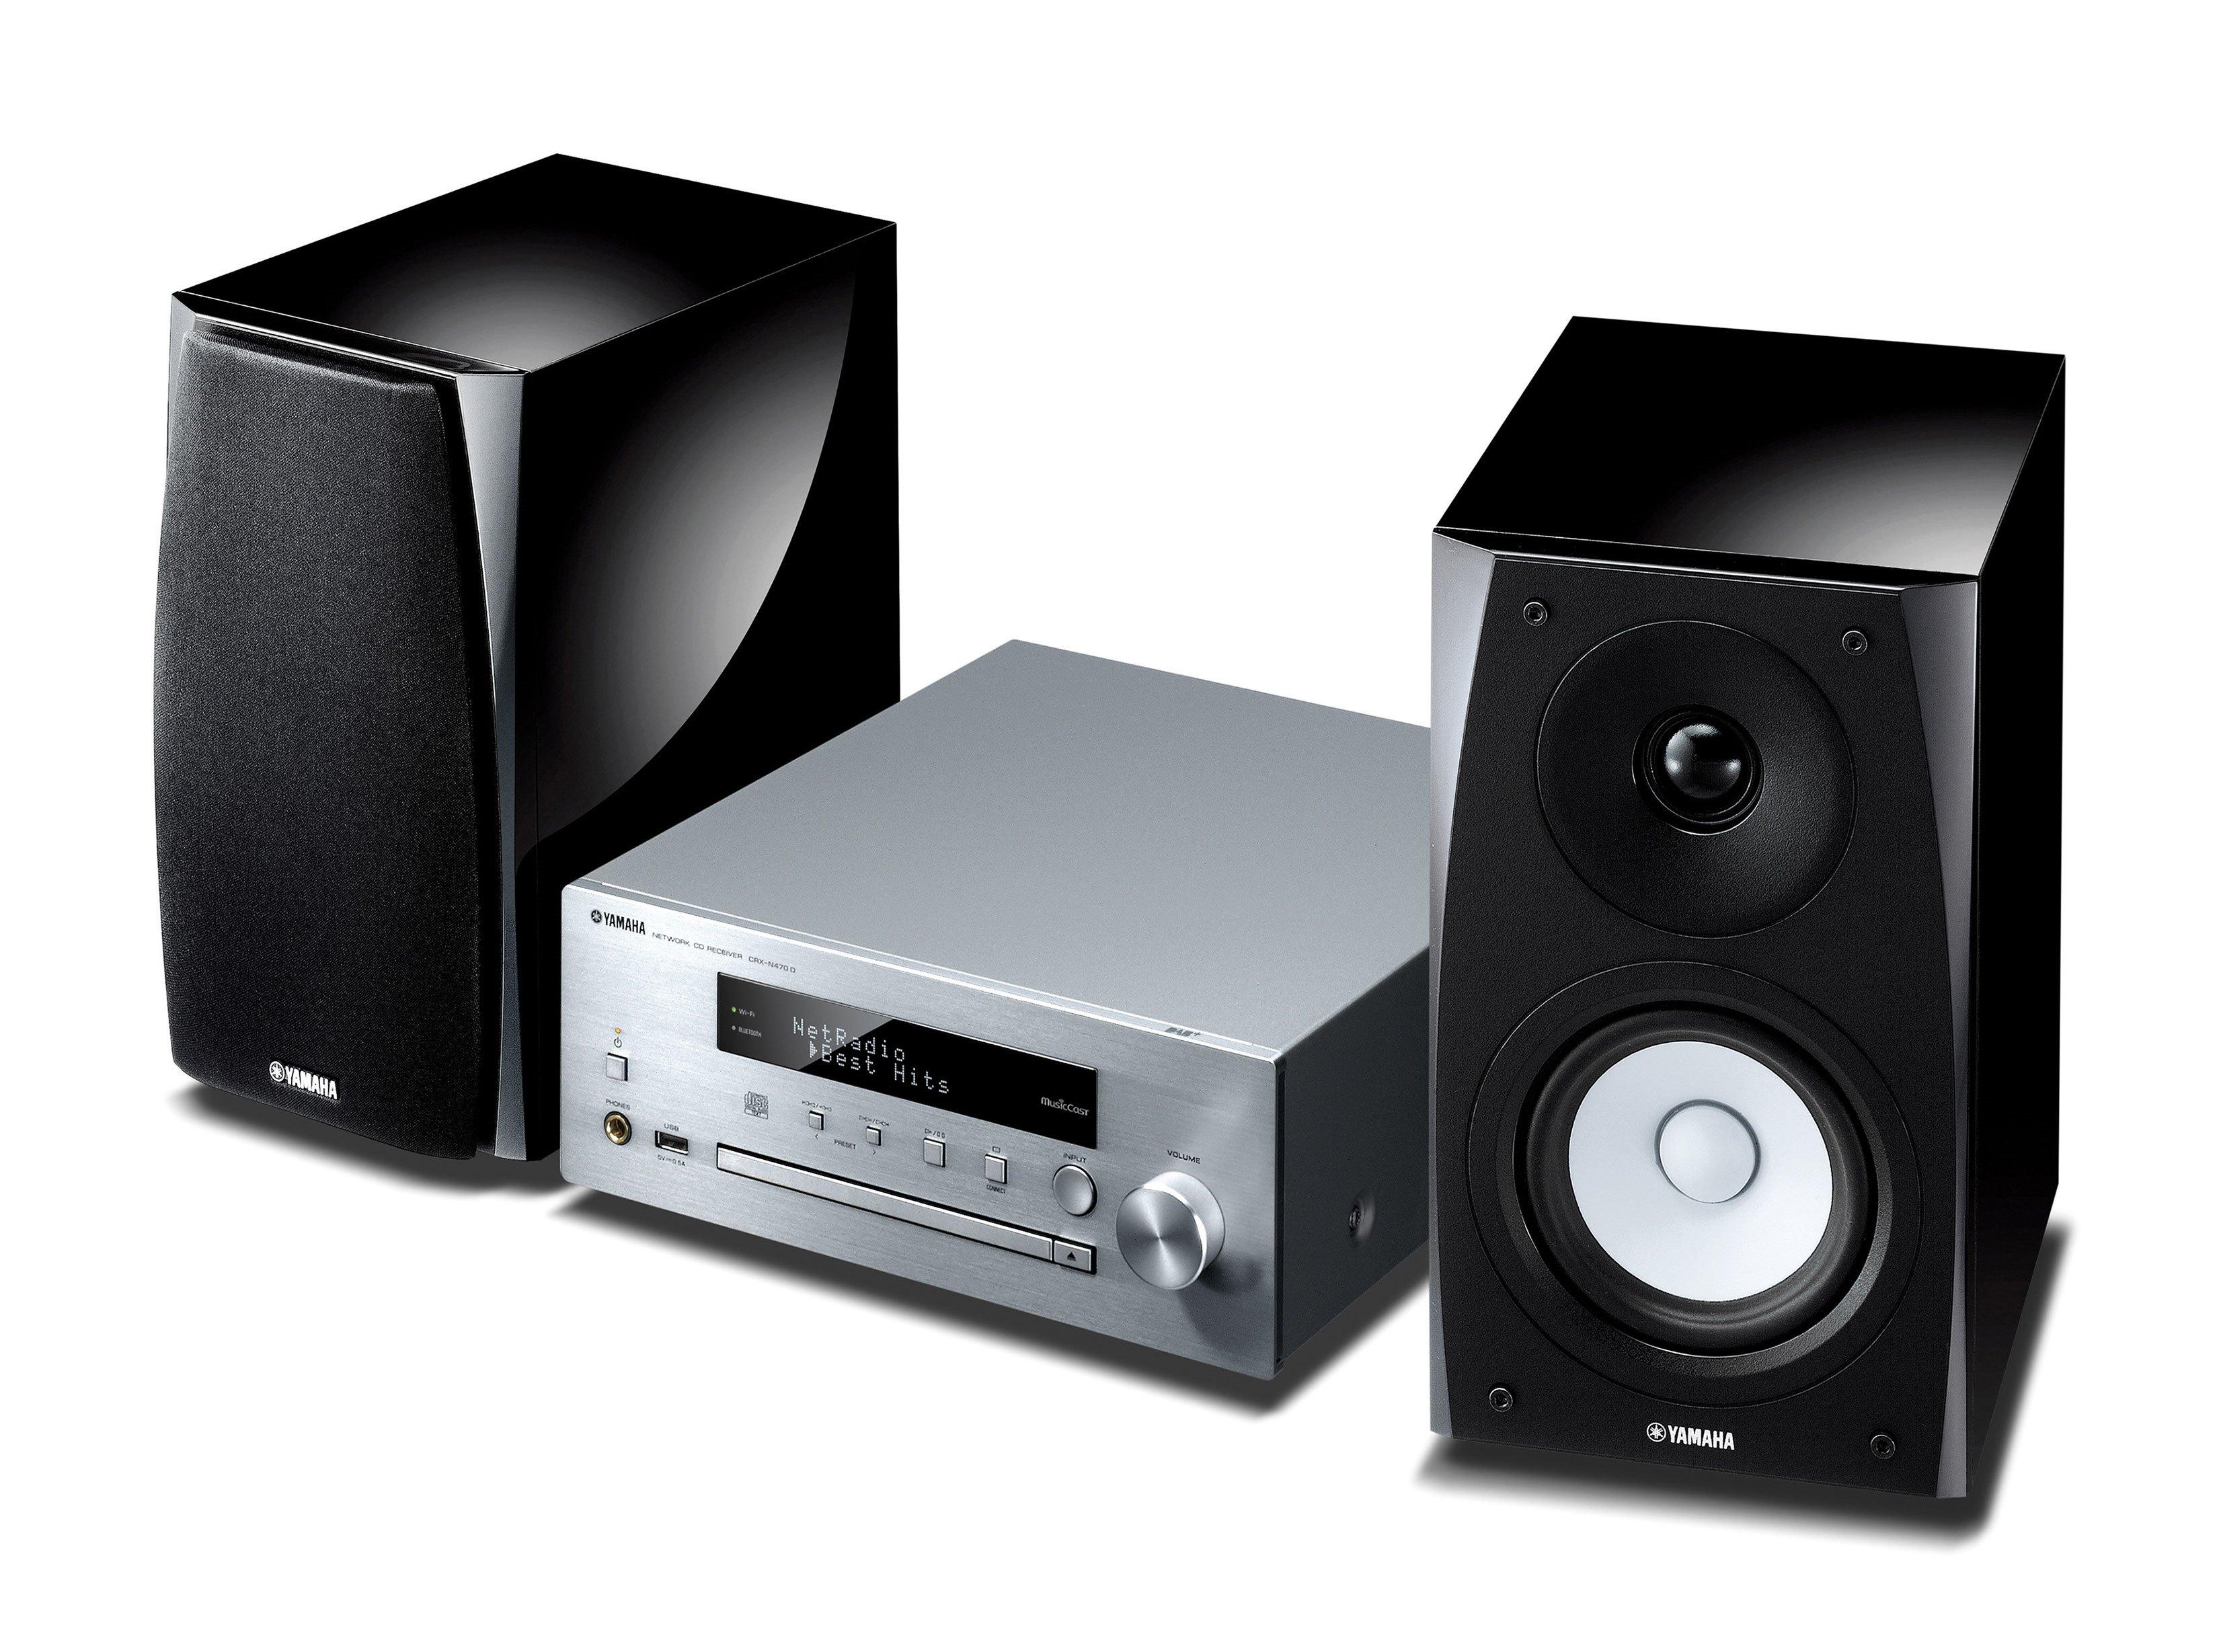 musiccast mcr n570d bersicht hifi systeme audio. Black Bedroom Furniture Sets. Home Design Ideas